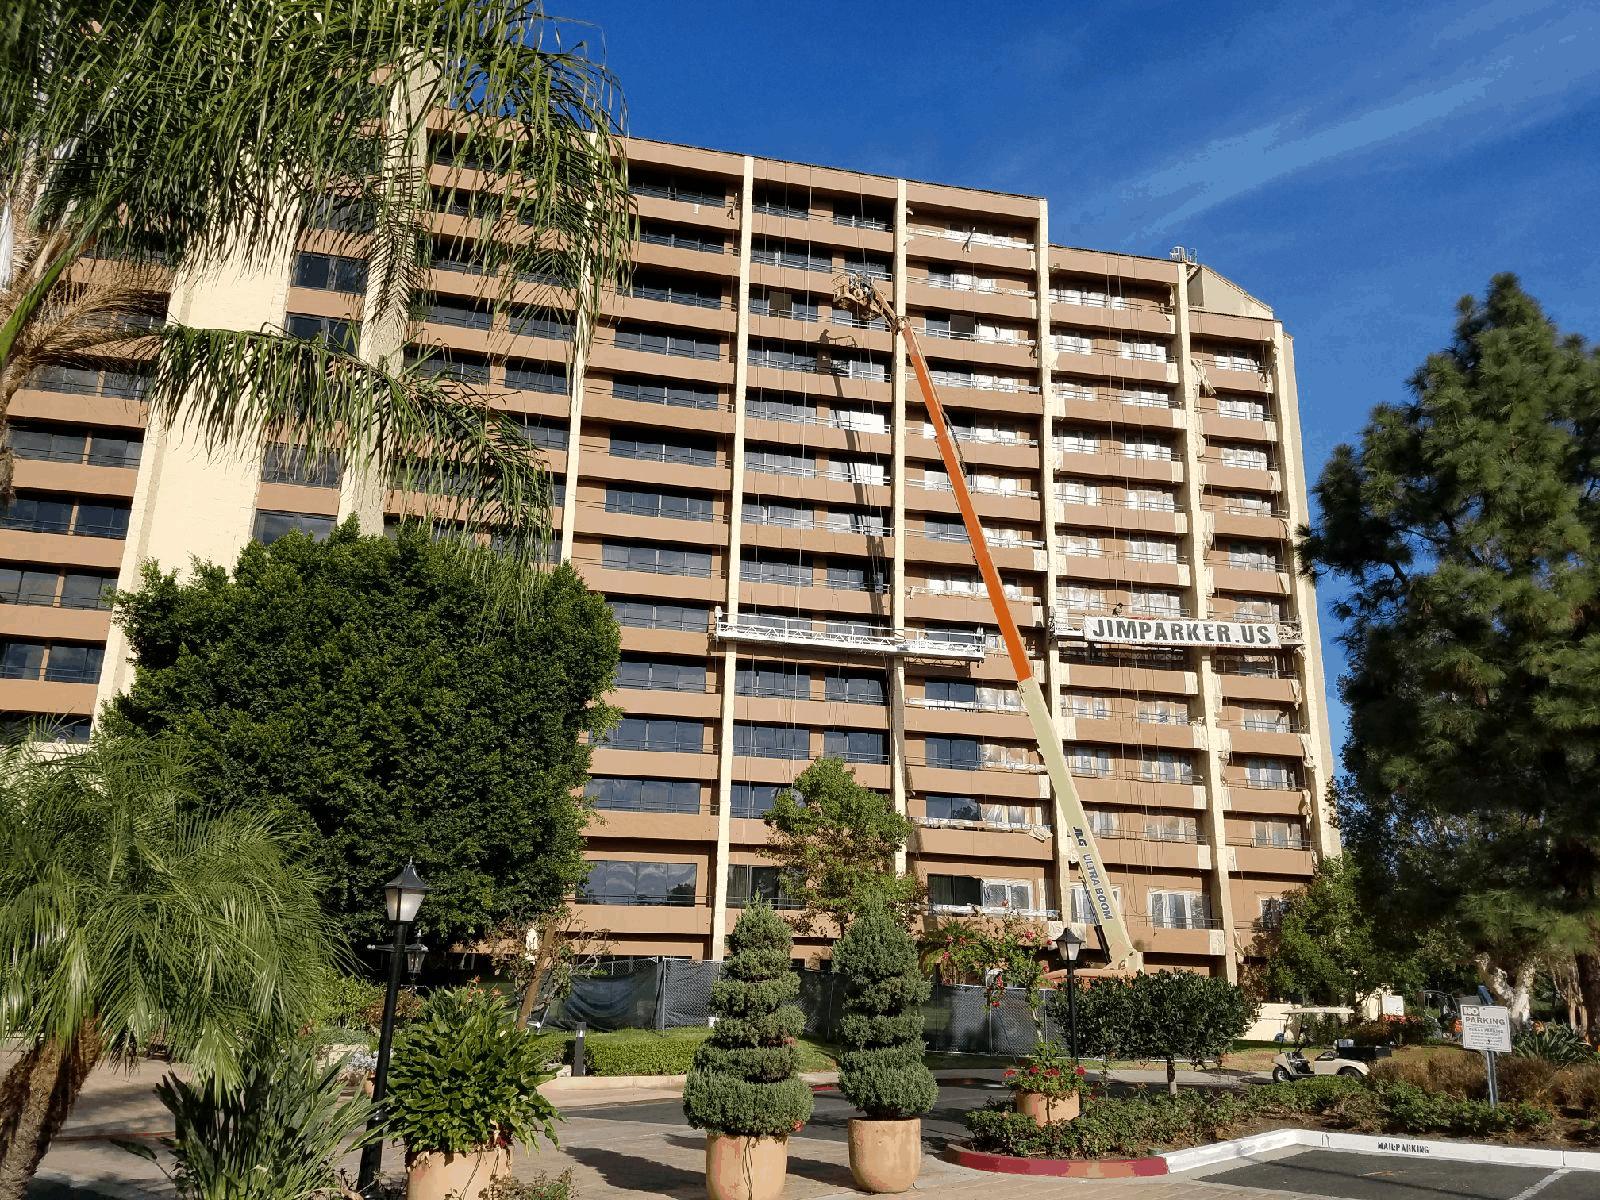 Towers at Laguna Woods Village case study | Jim Parker - Los